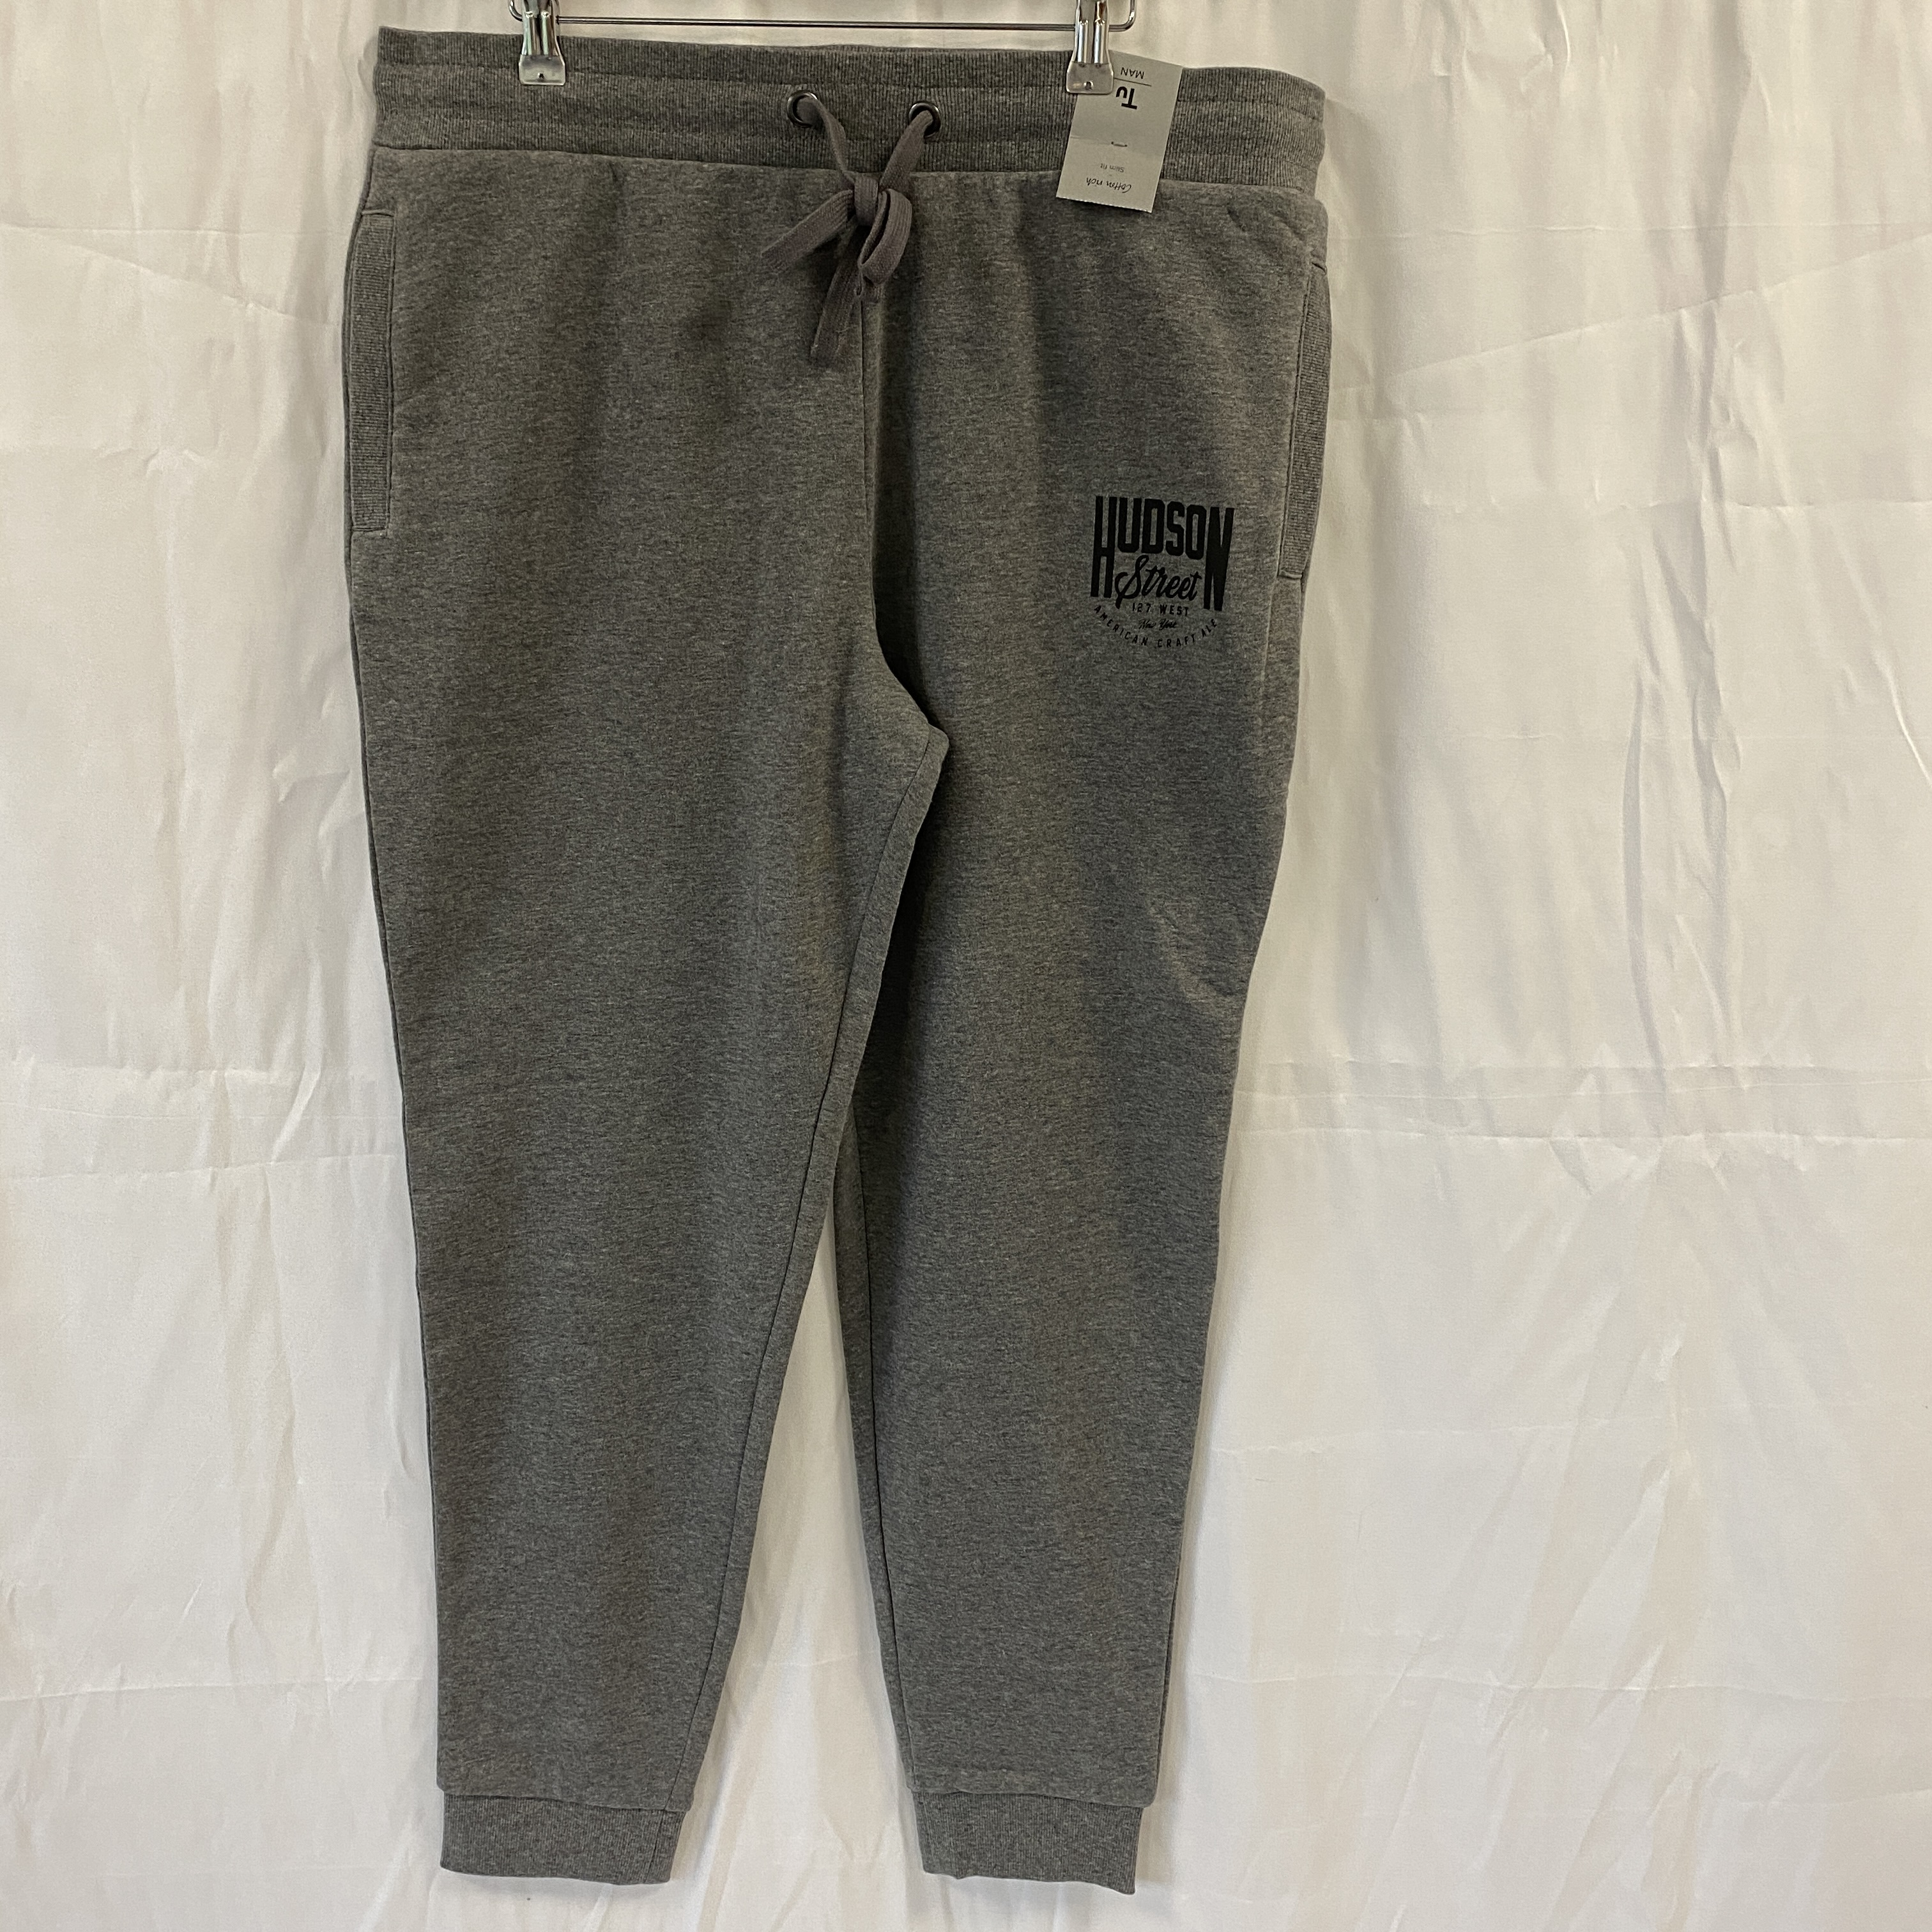 Brand New TU Grey Jogging Bottoms - Size L